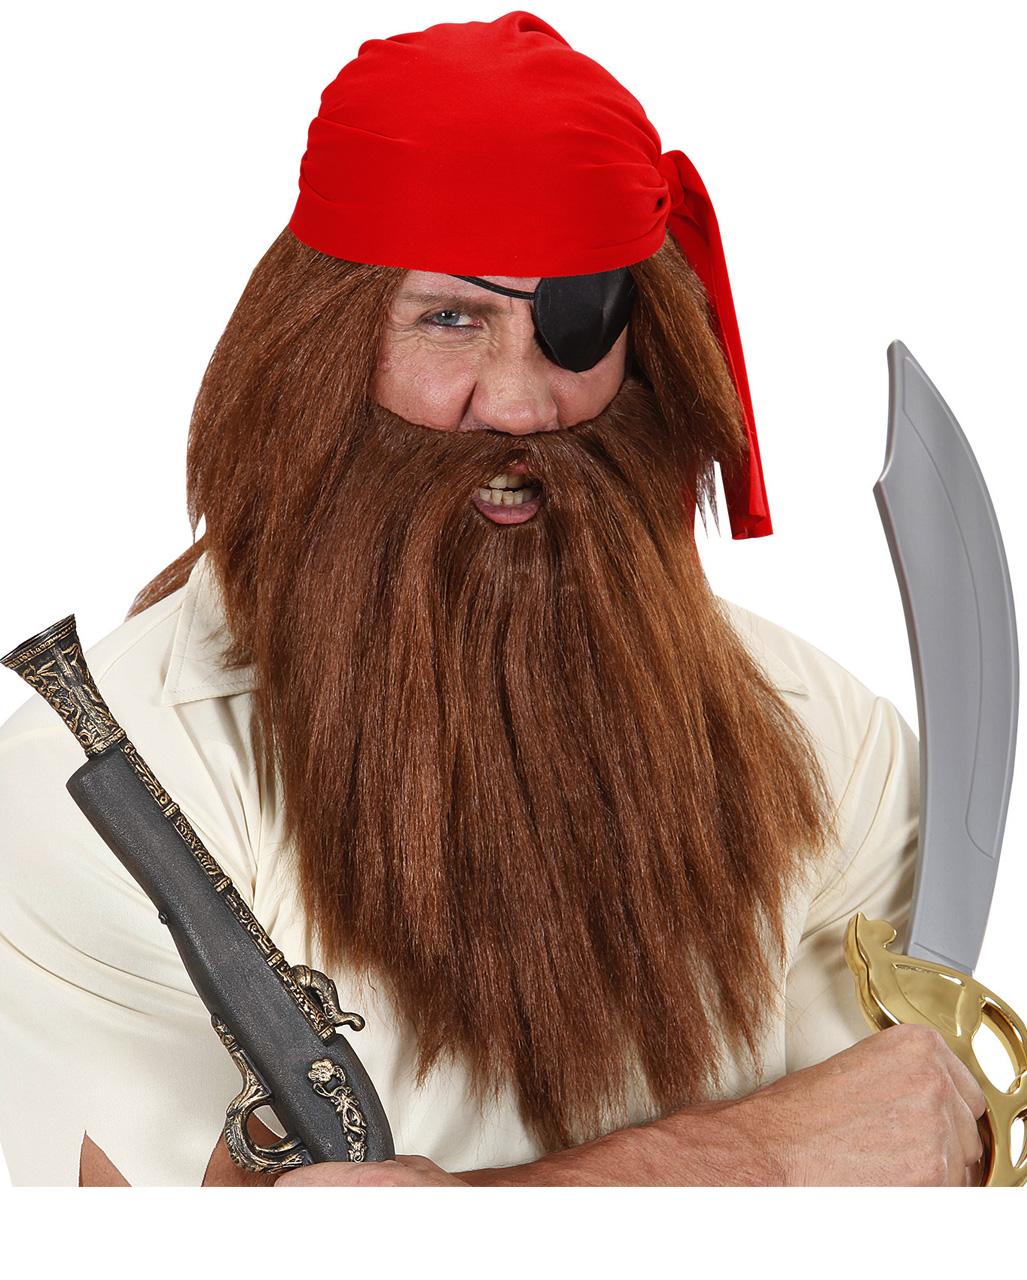 Pirate Beard Set Brown Carribean with Moustache Fancy Dress Costume Accessory Ne